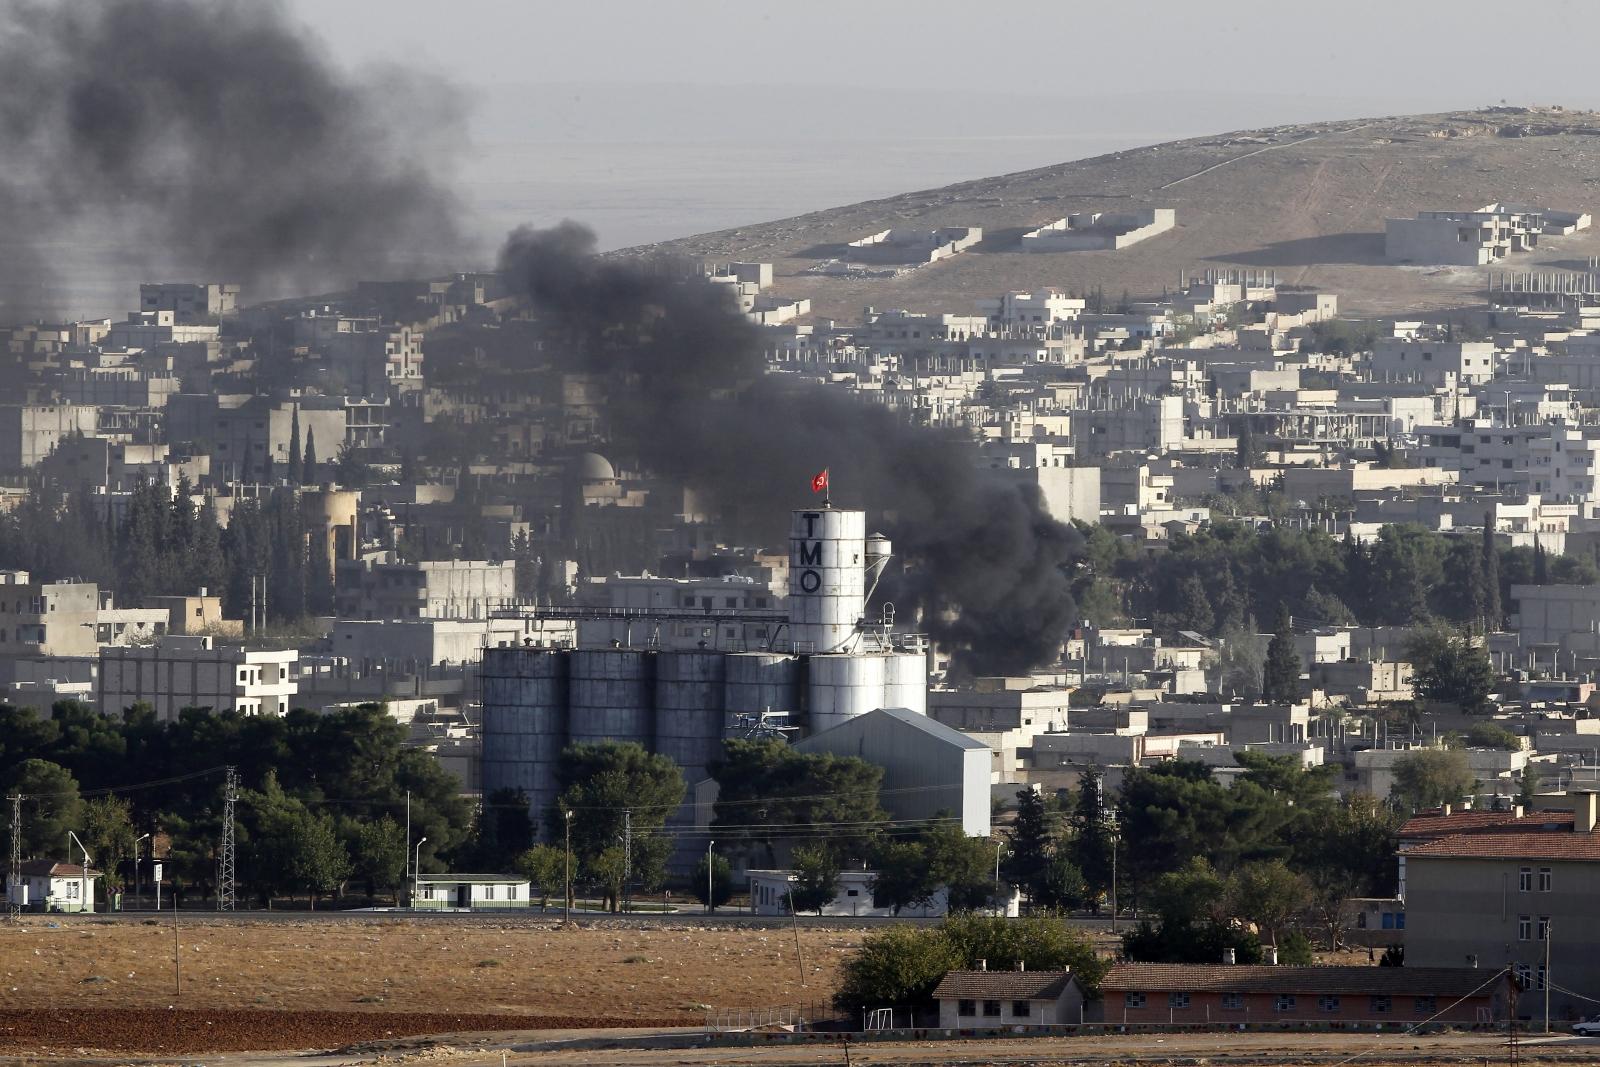 Smoke rises over Kobani during fighting between isis militants and Kurdish fighters last week. (Getty)